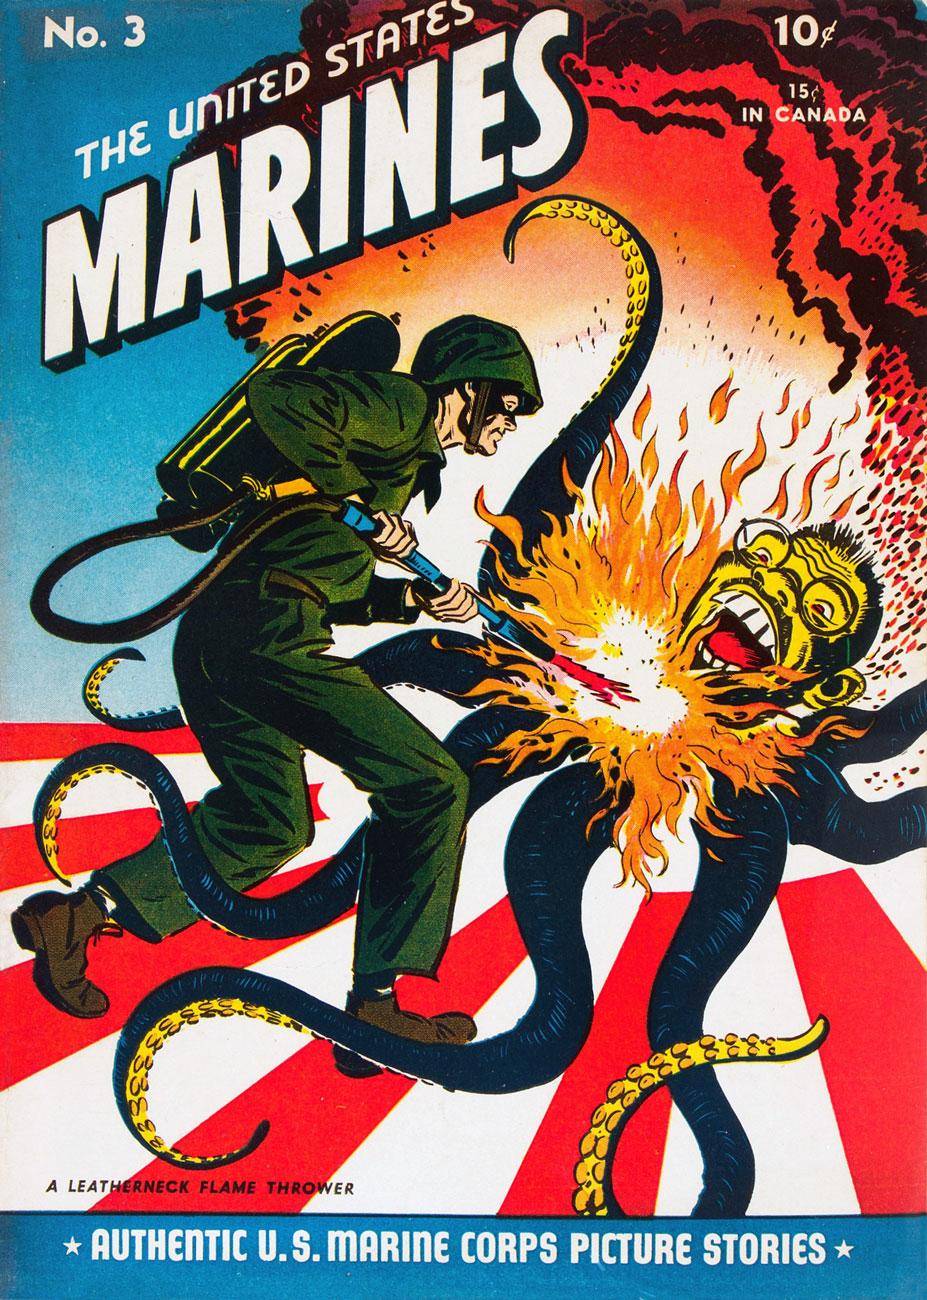 The-United-States-Marines-no.3